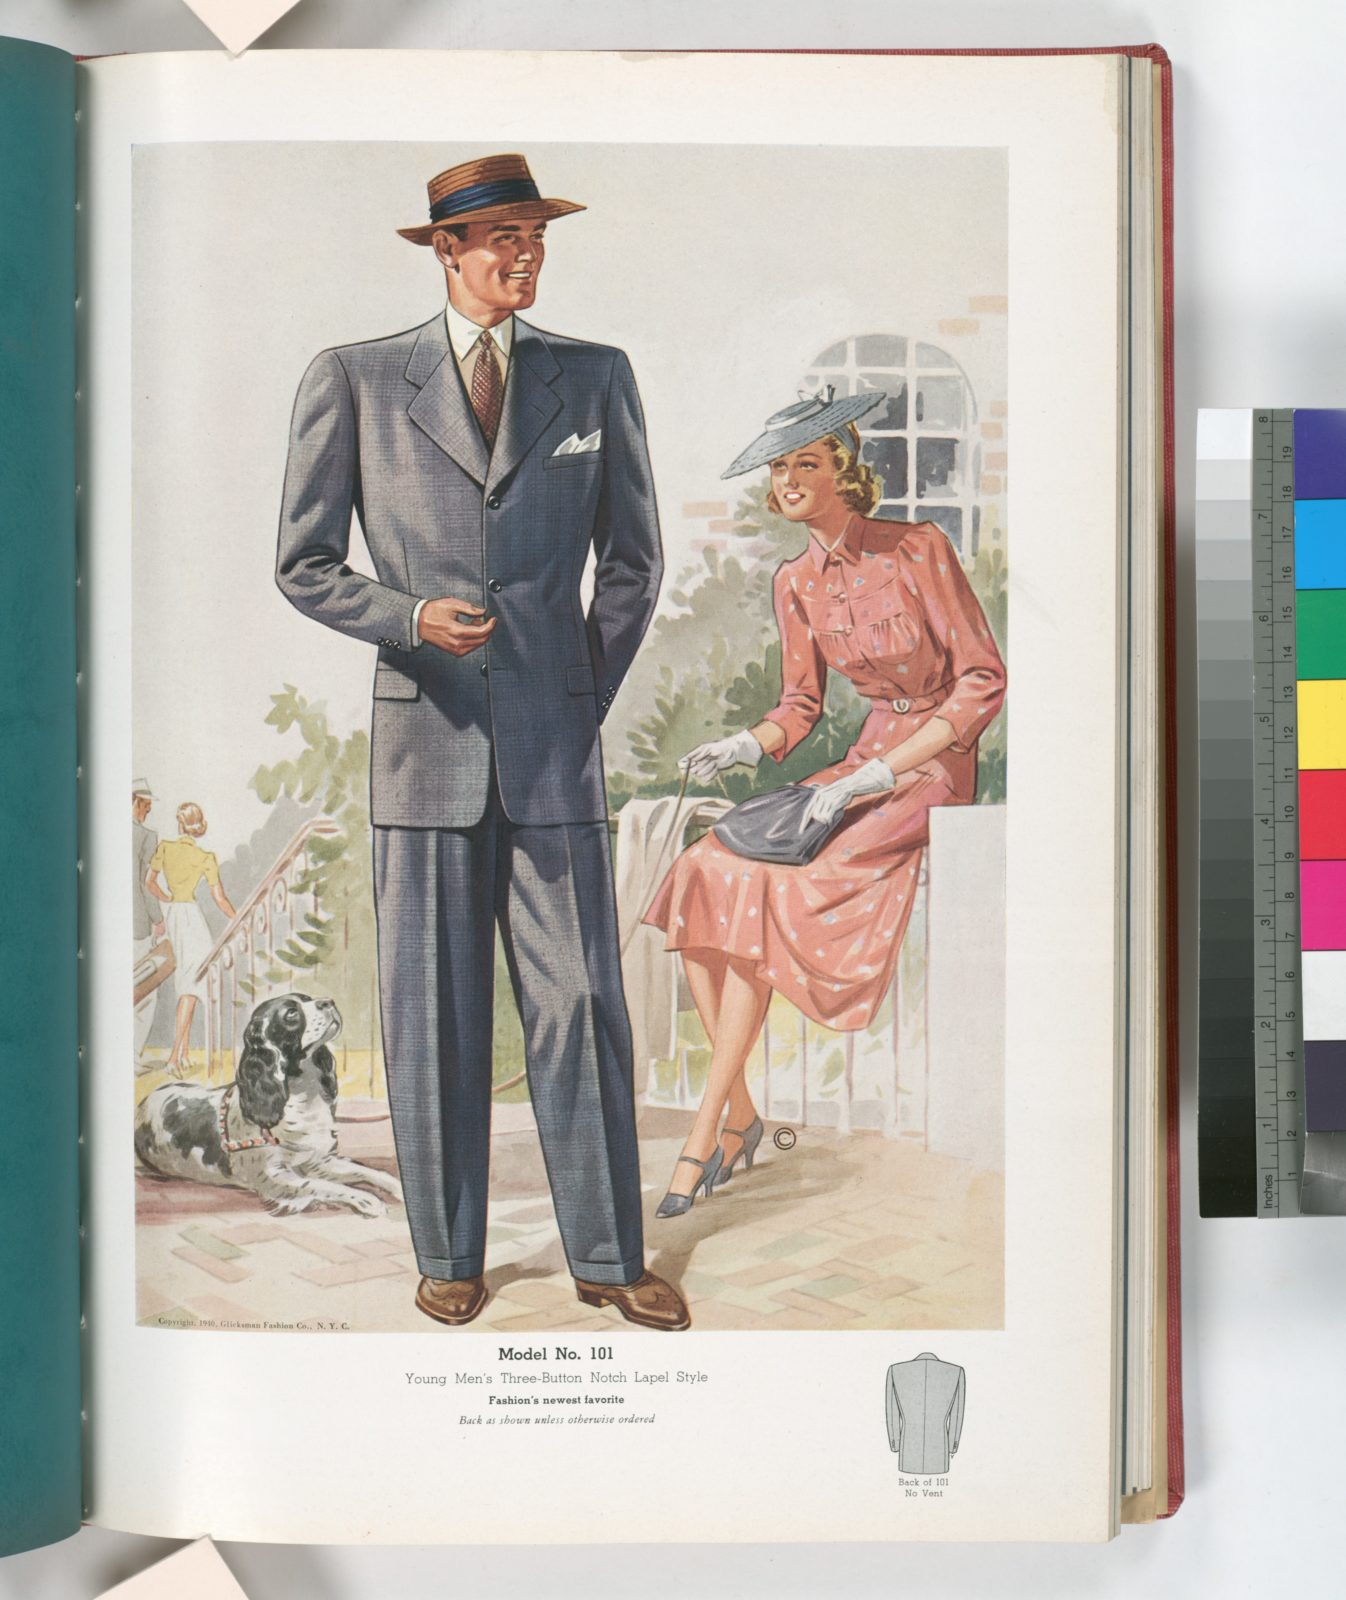 Model No. 101. Young men's three-button notch lapel style.